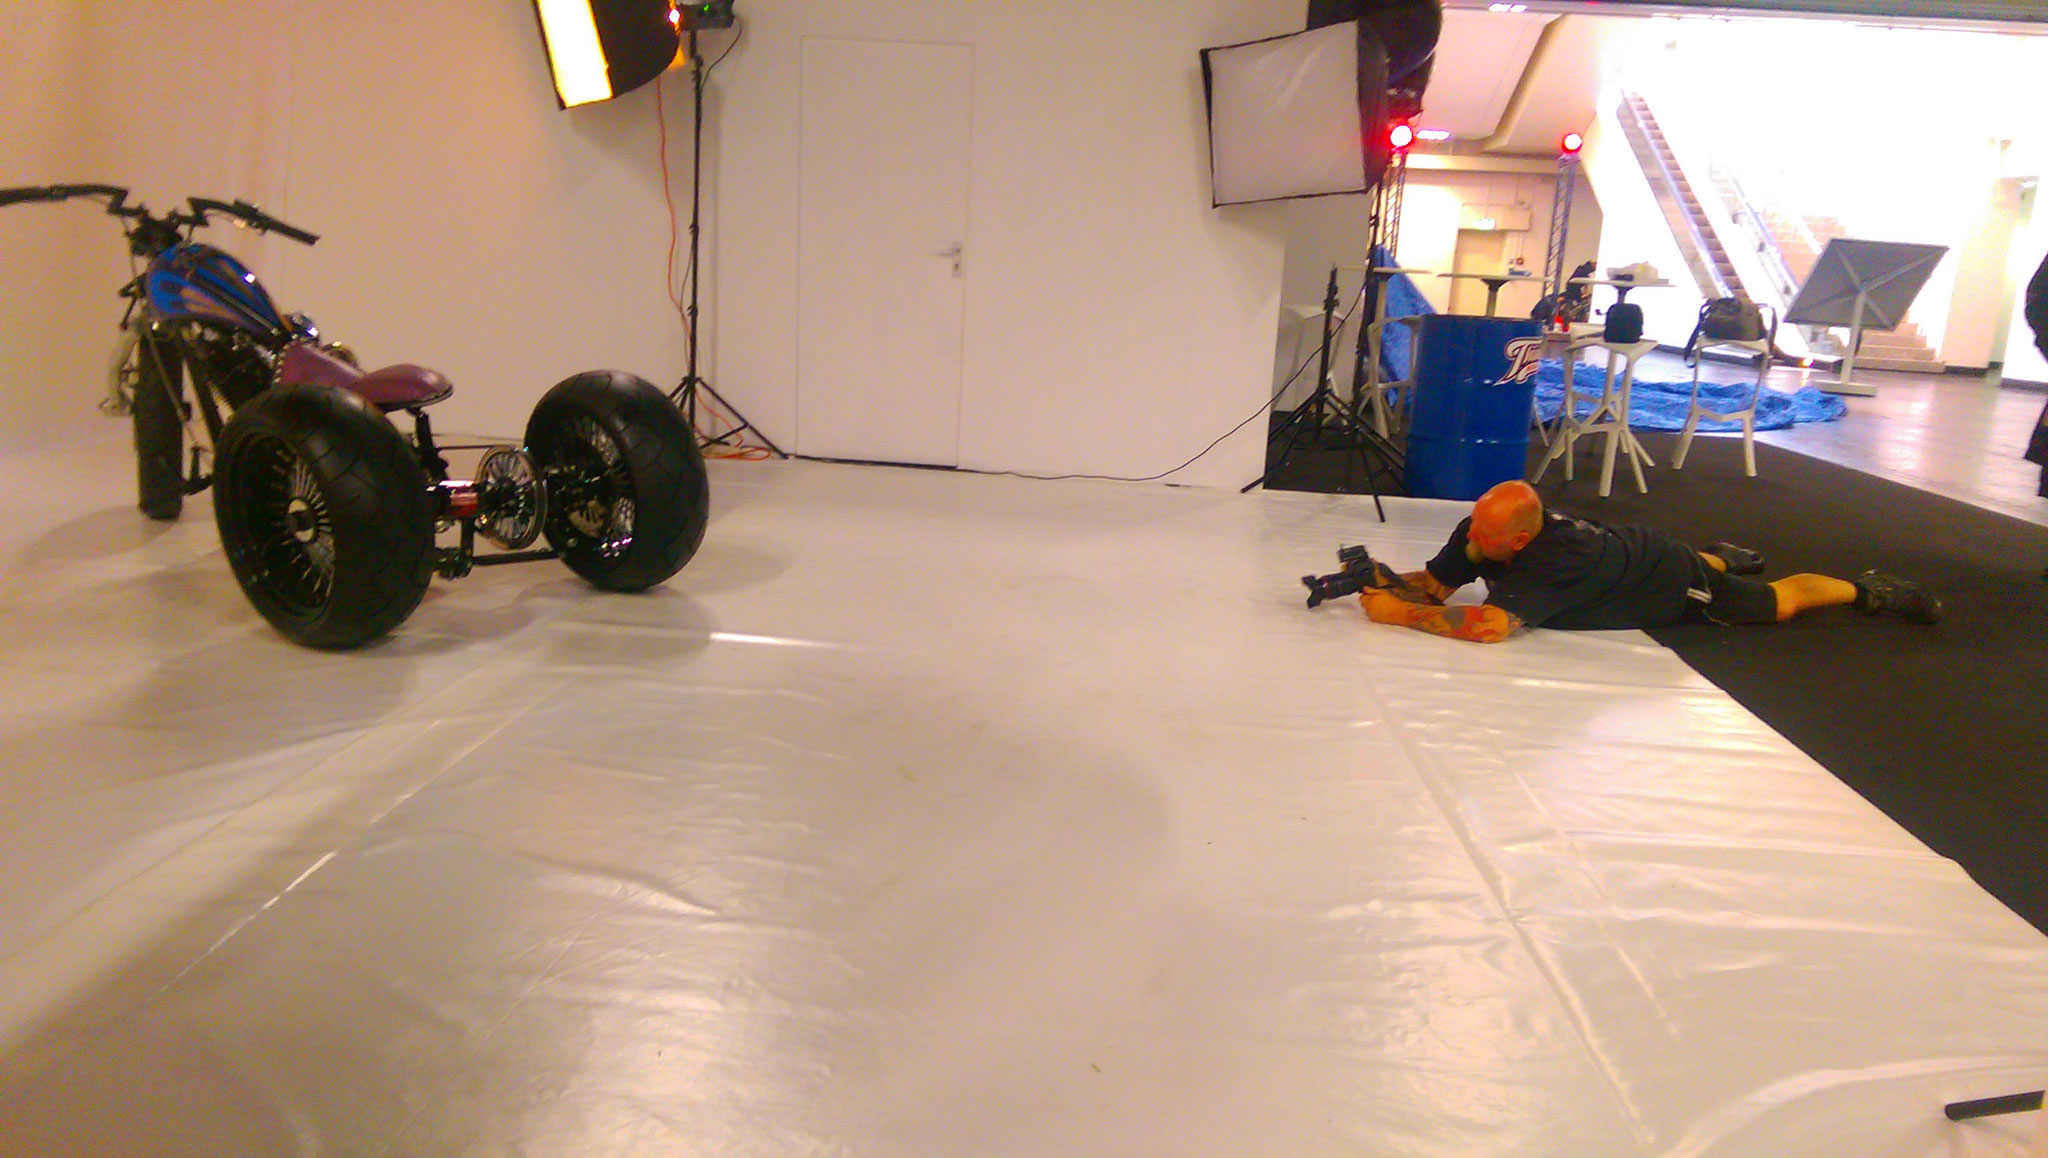 Mein Kollege Onno Wieringa beim Shooting